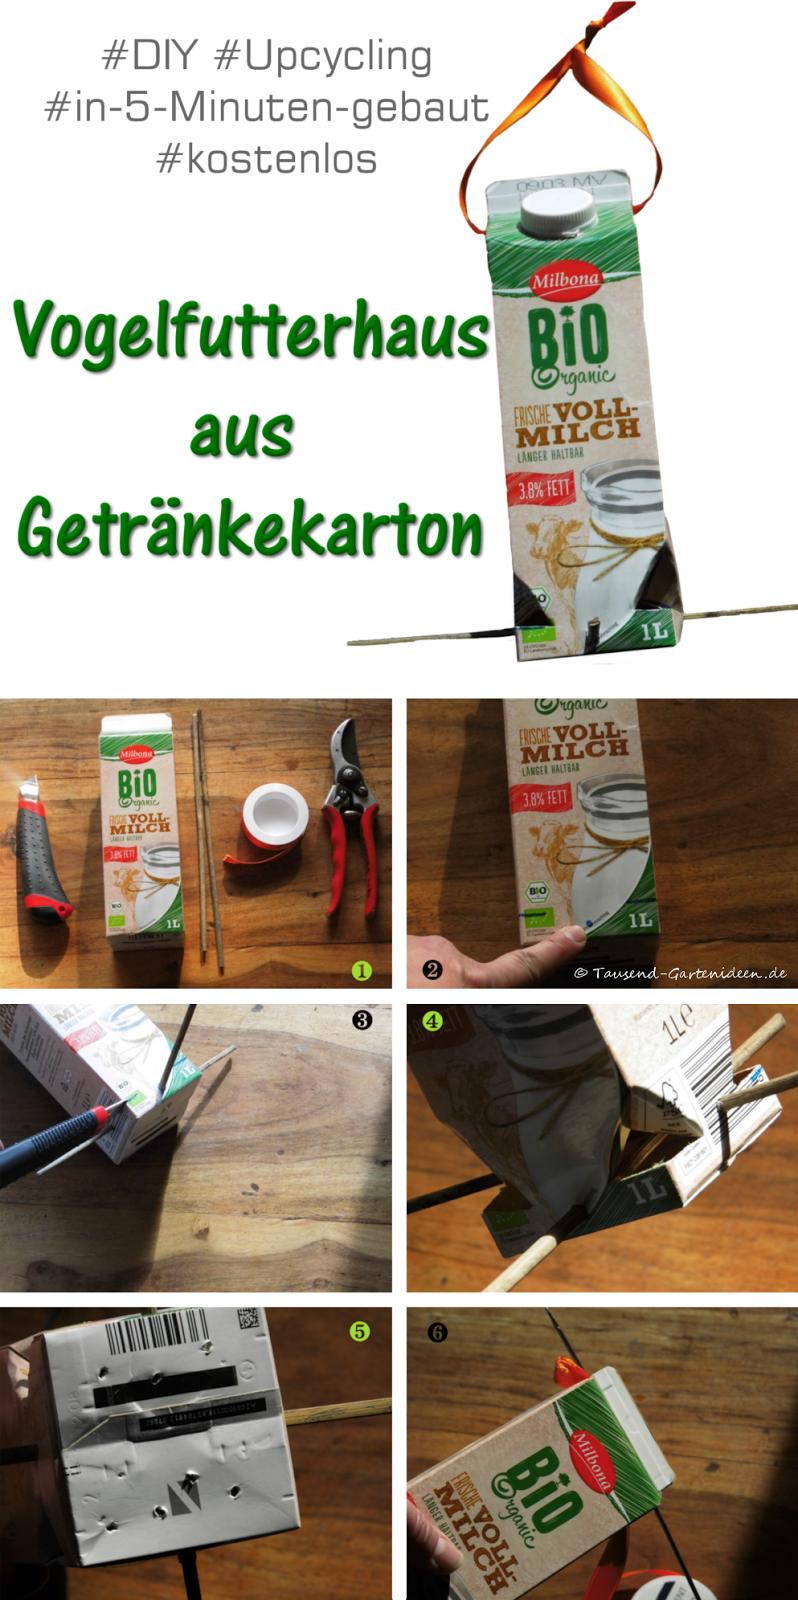 Bauanleitung Vogel-Futterhaus aus Getränkekarton